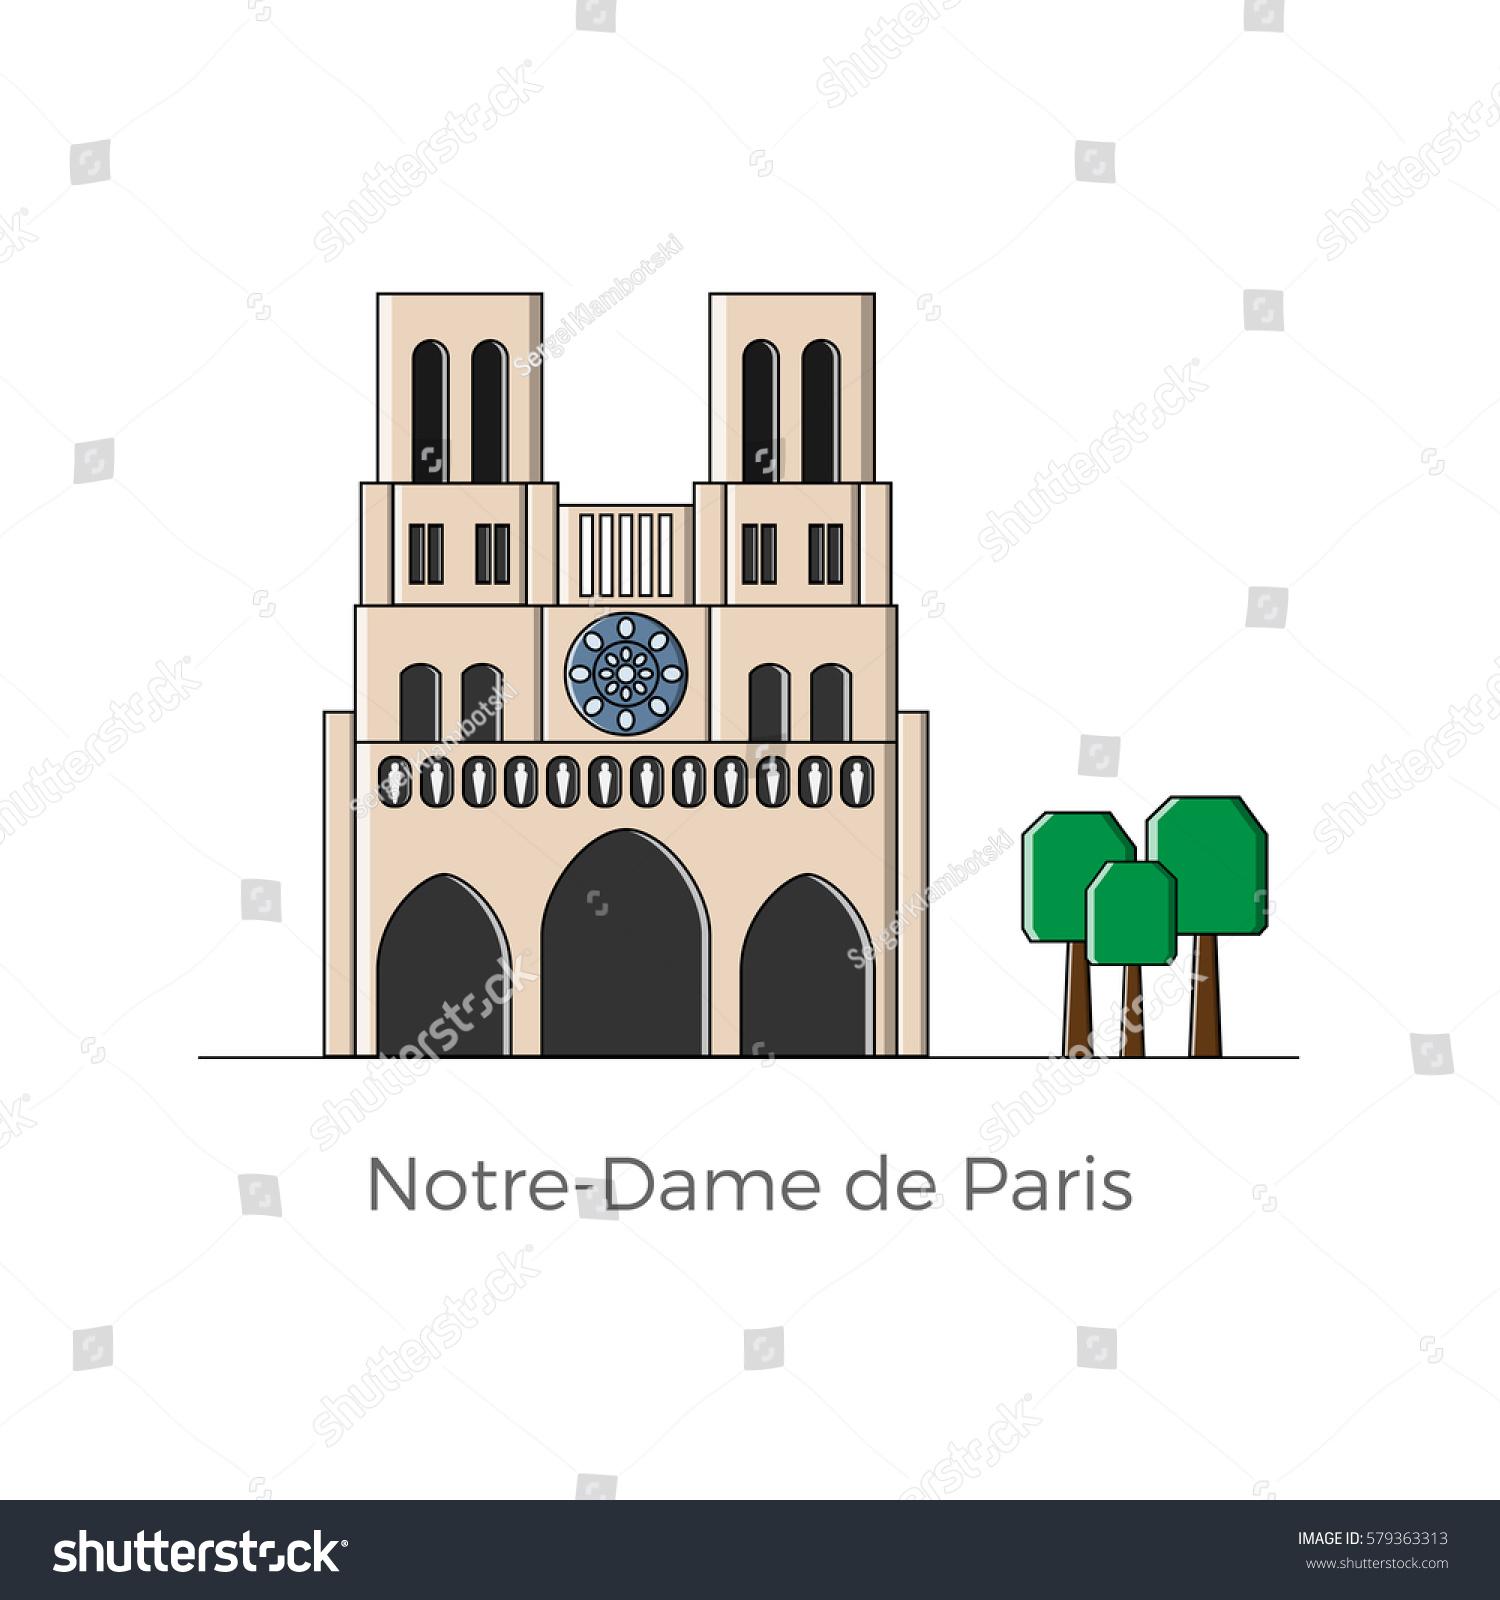 Notredame De Paris Vector Illustration Flat Stock Vector 579363313 ...